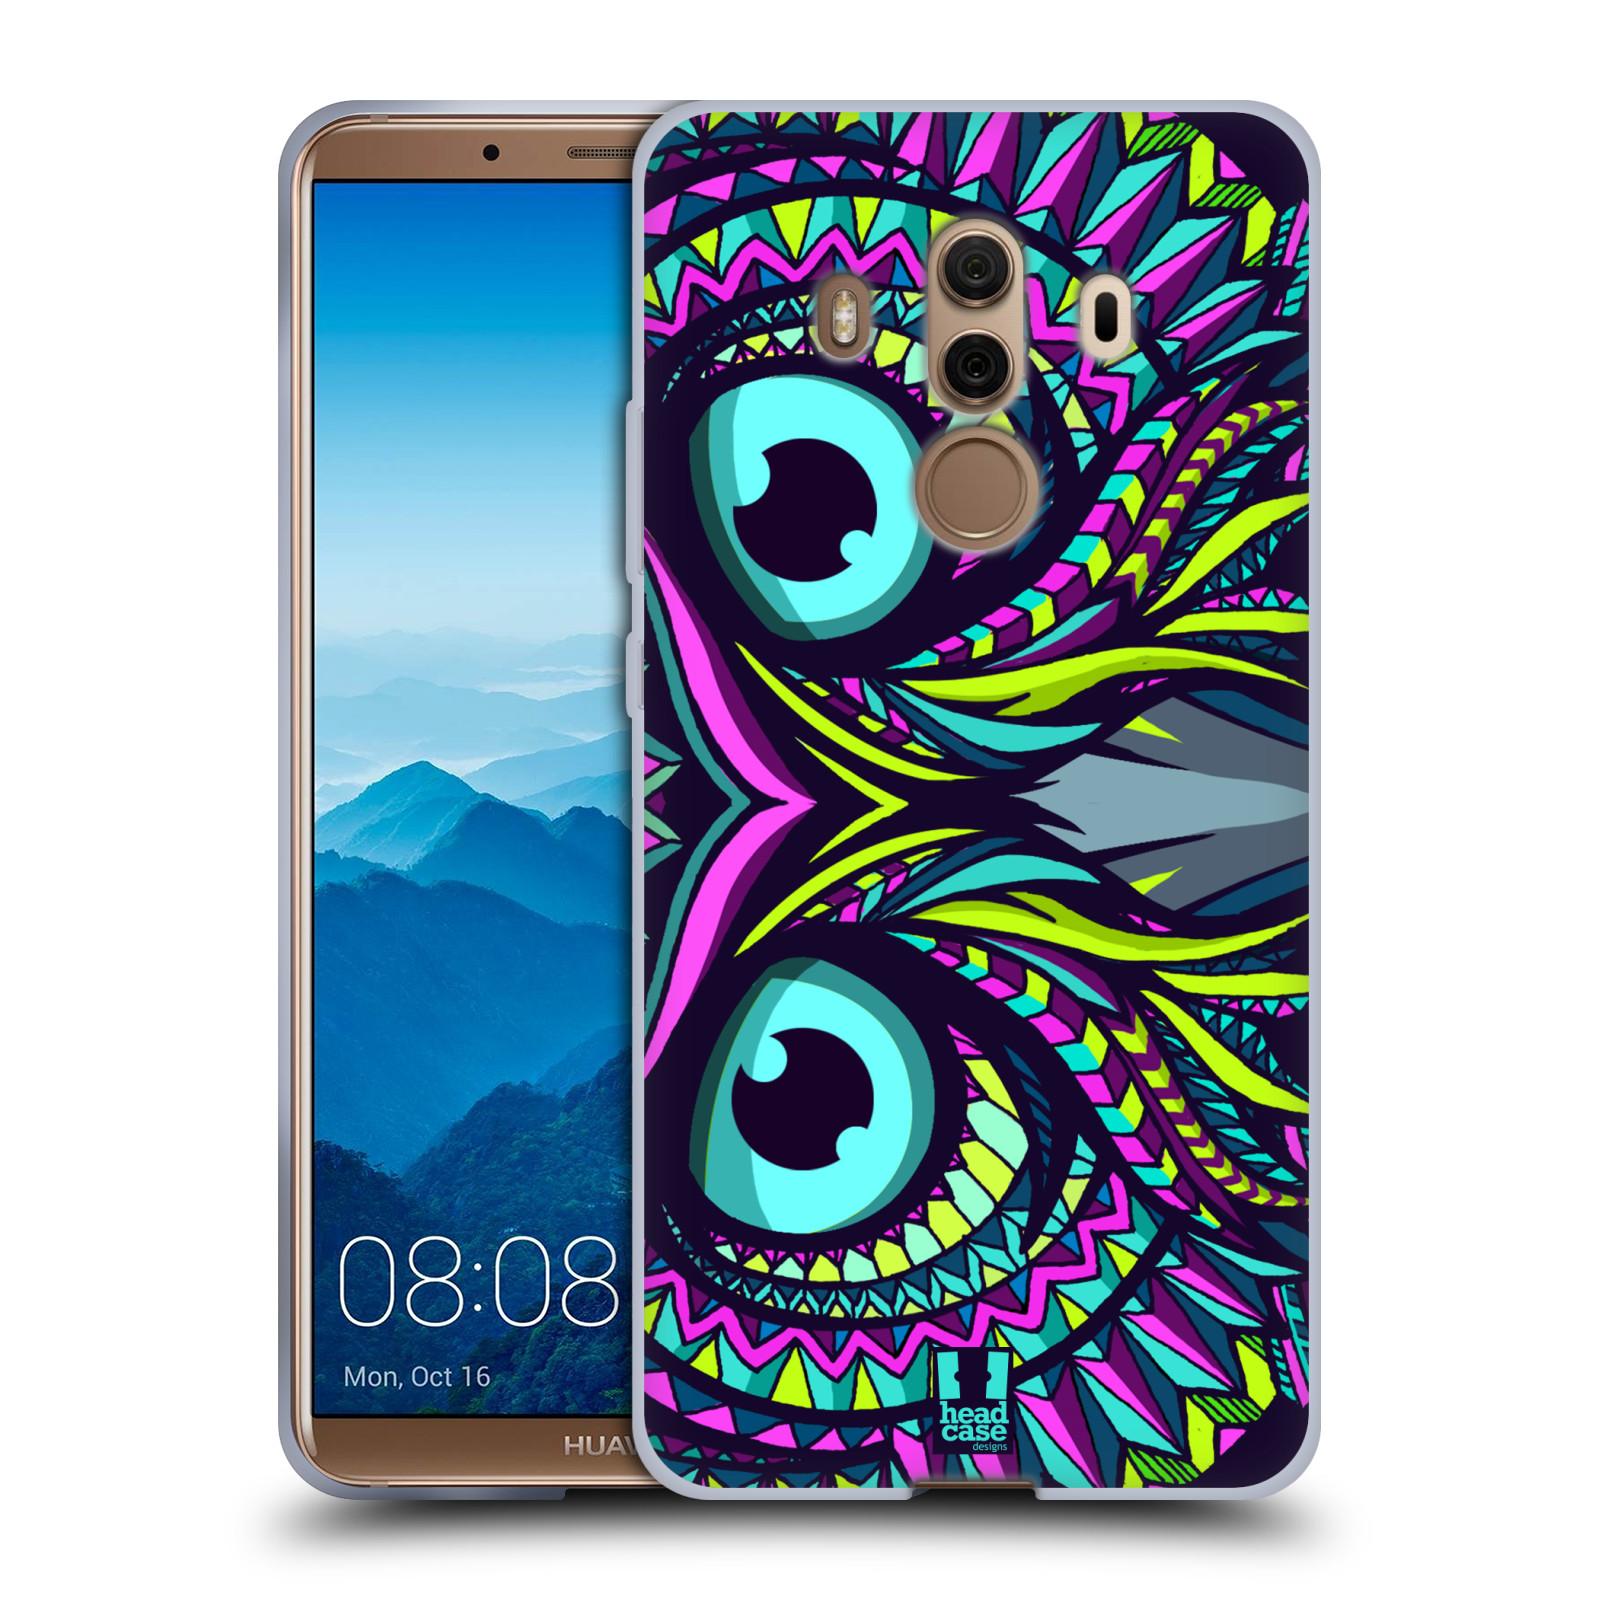 Silikonové pouzdro na mobil Huawei Mate 10 Pro - Head Case - AZTEC SOVA